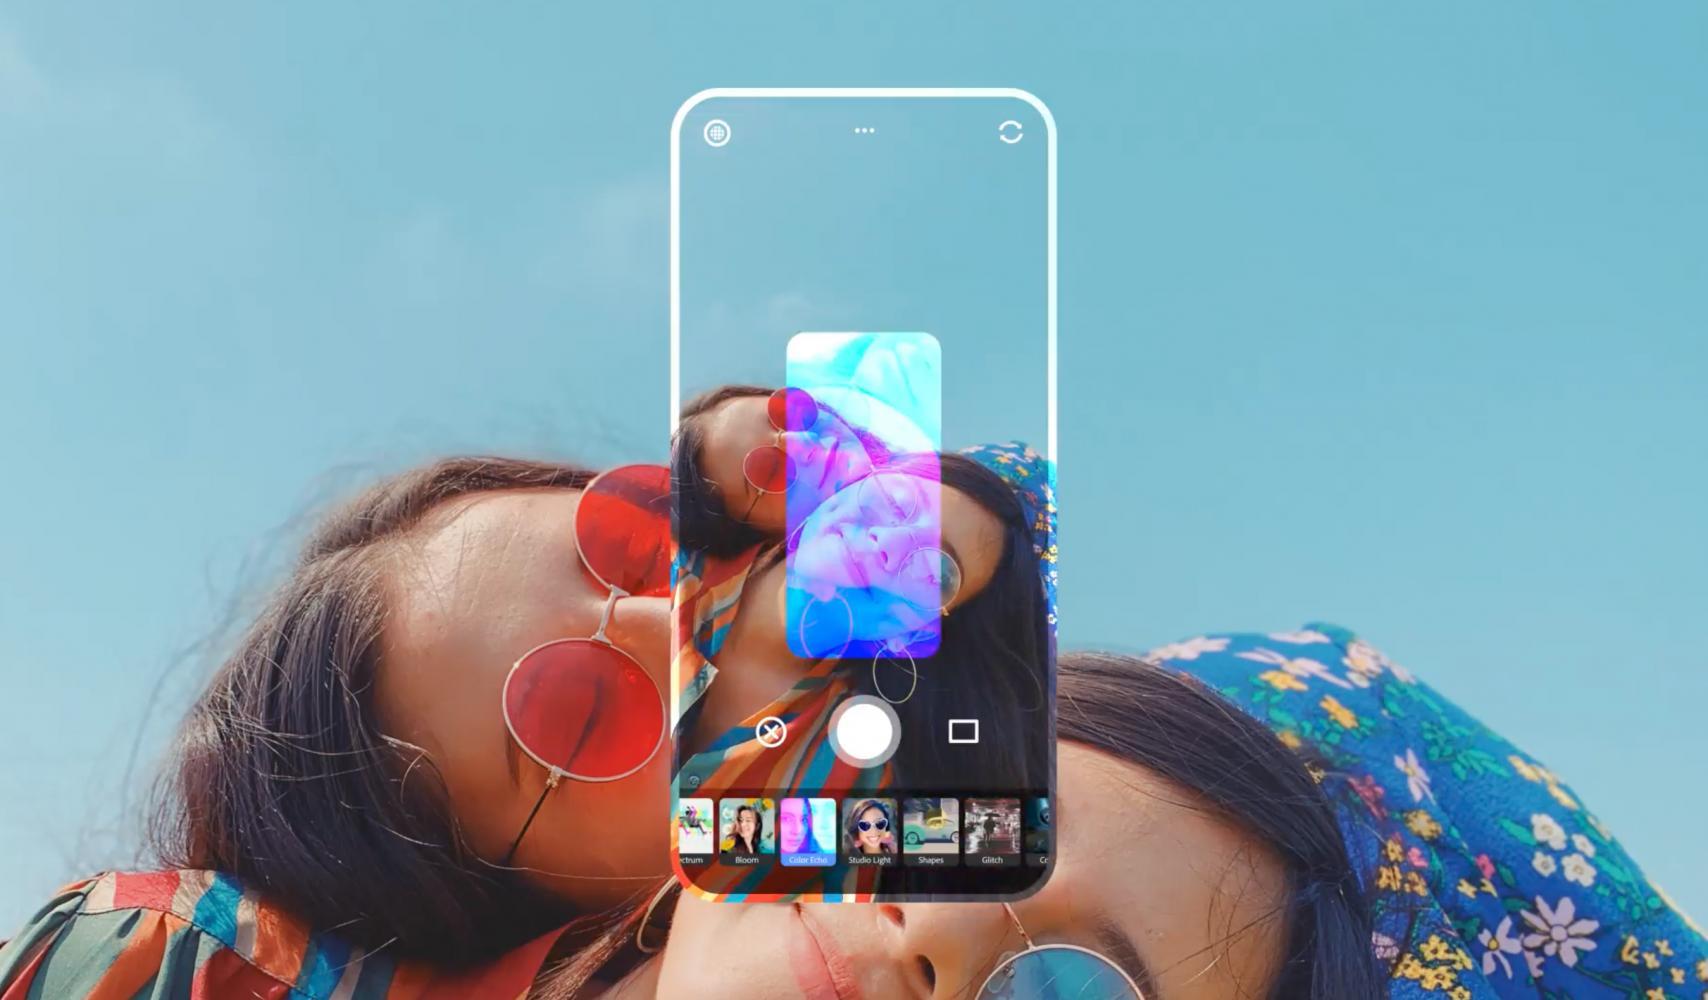 Adobe släpper mobilappen Photoshop Camera